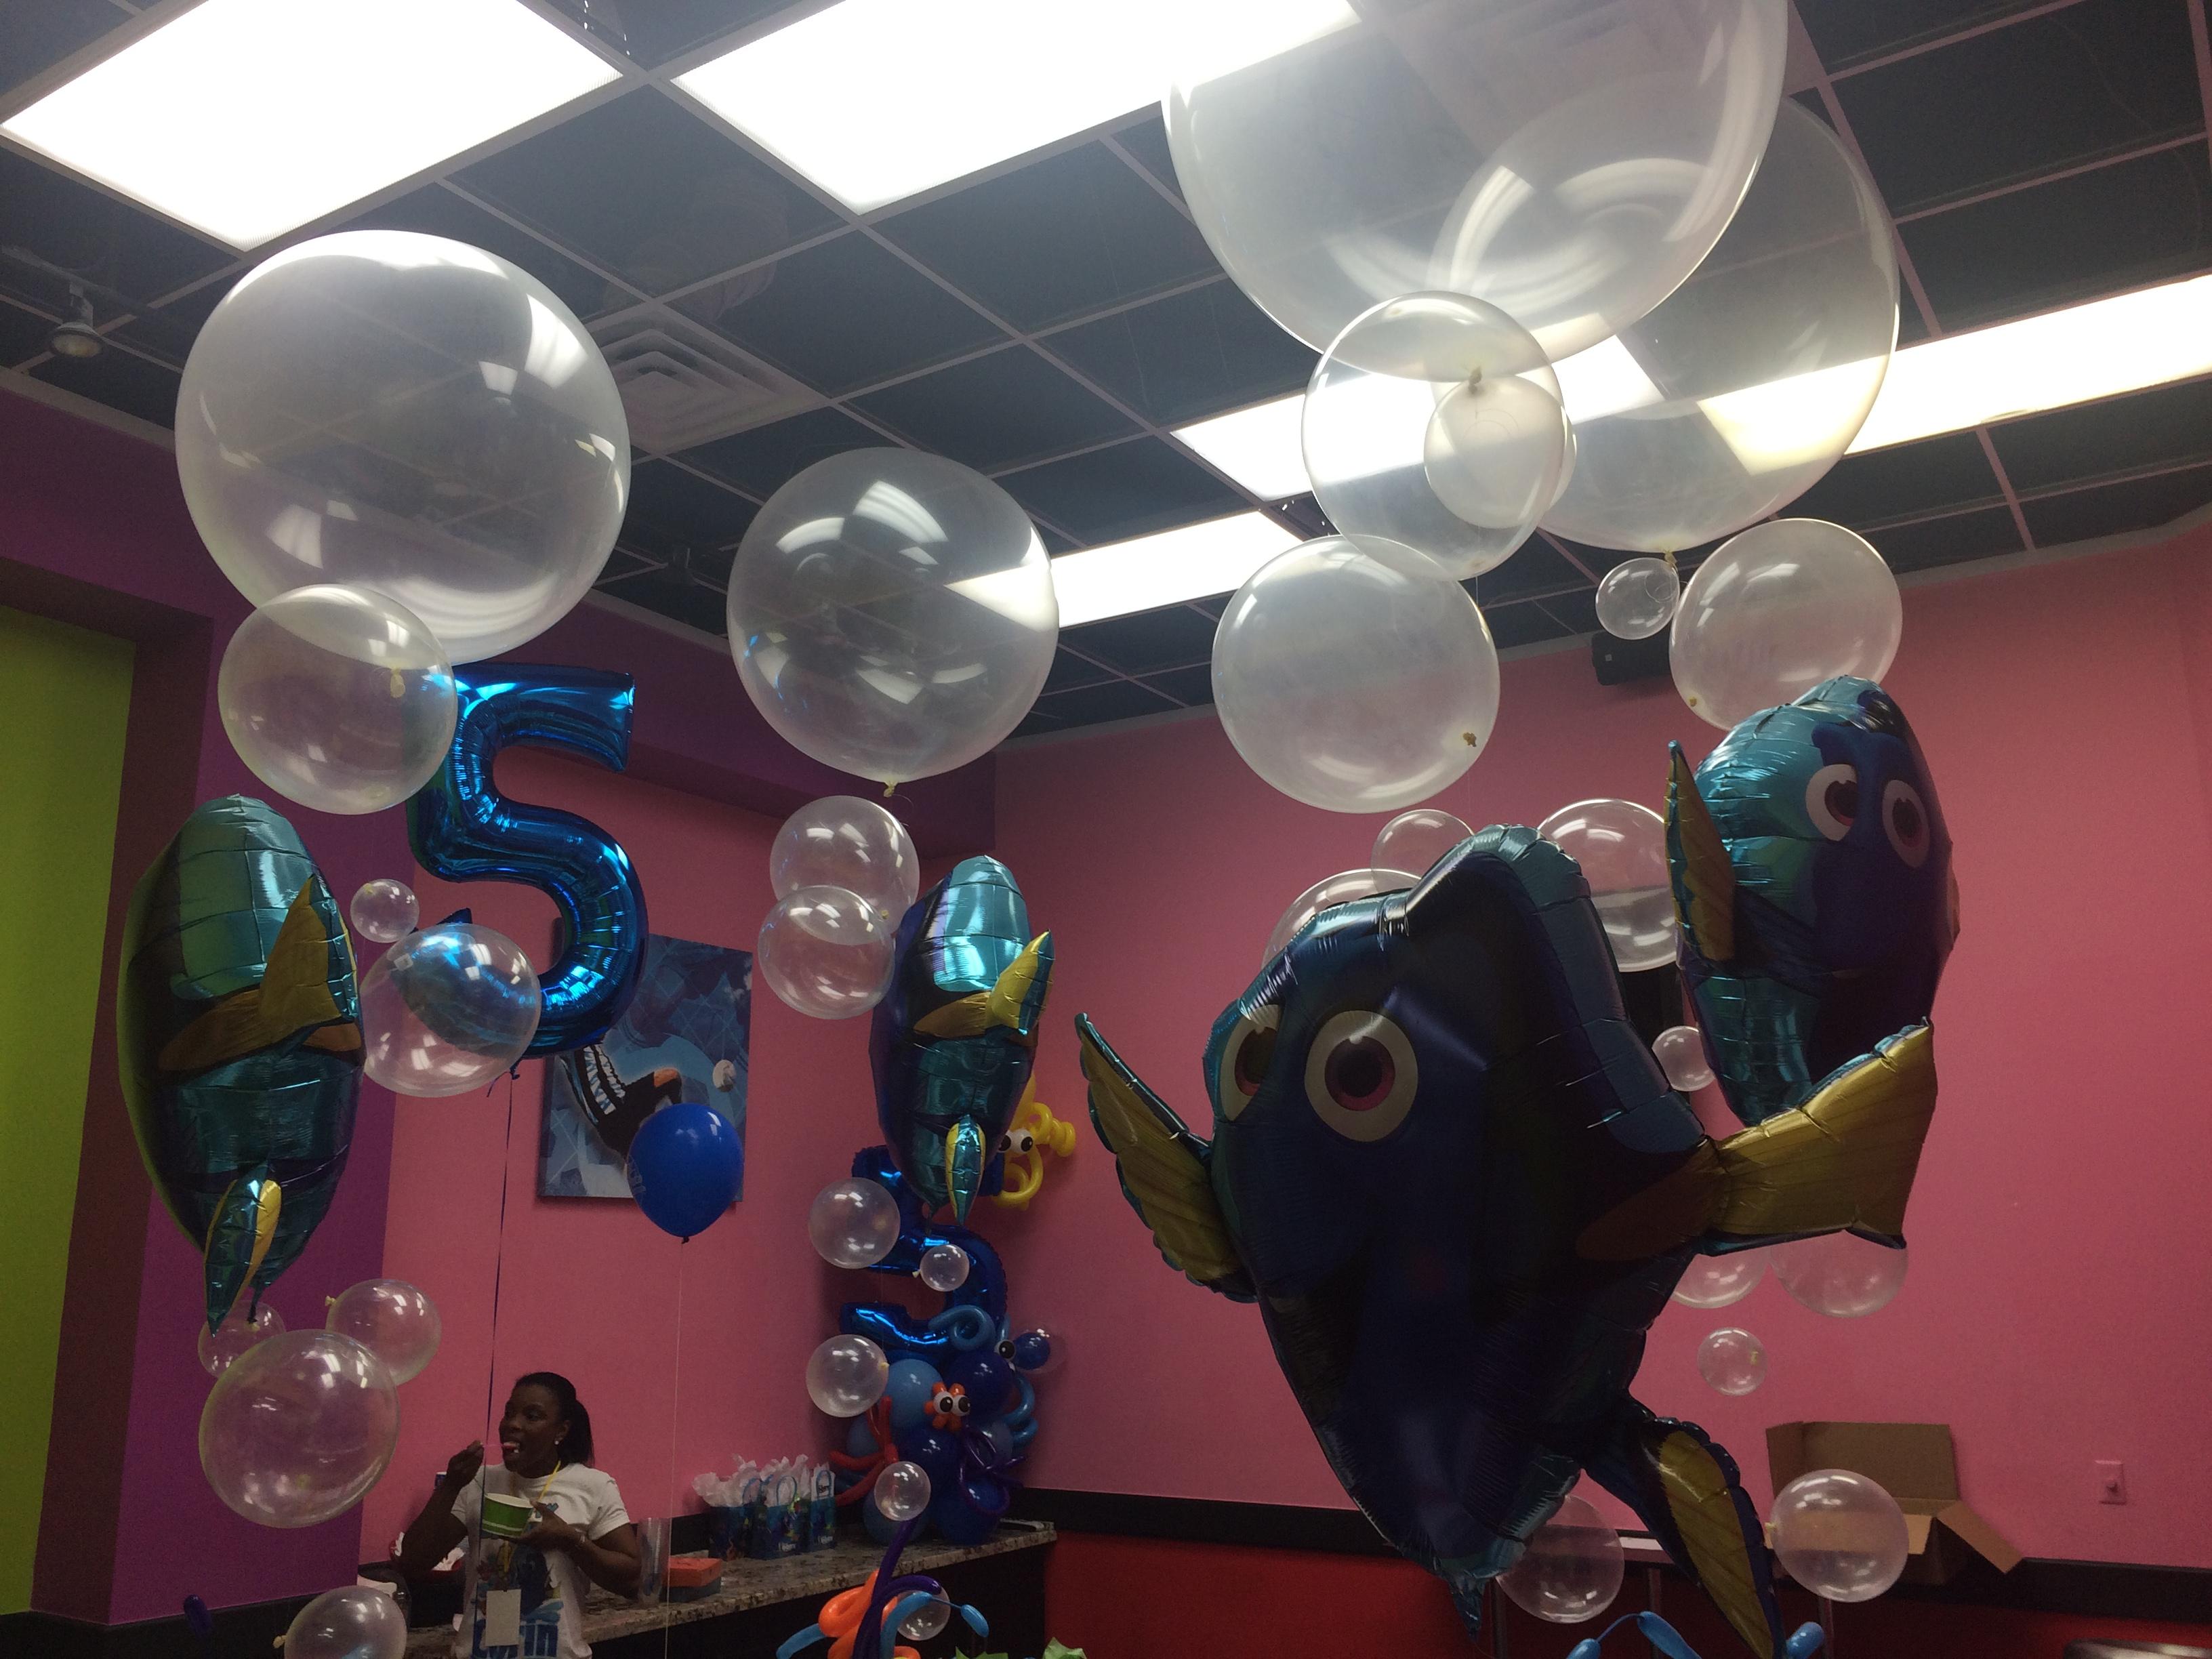 Finding Dory Balloon Decoration Idea